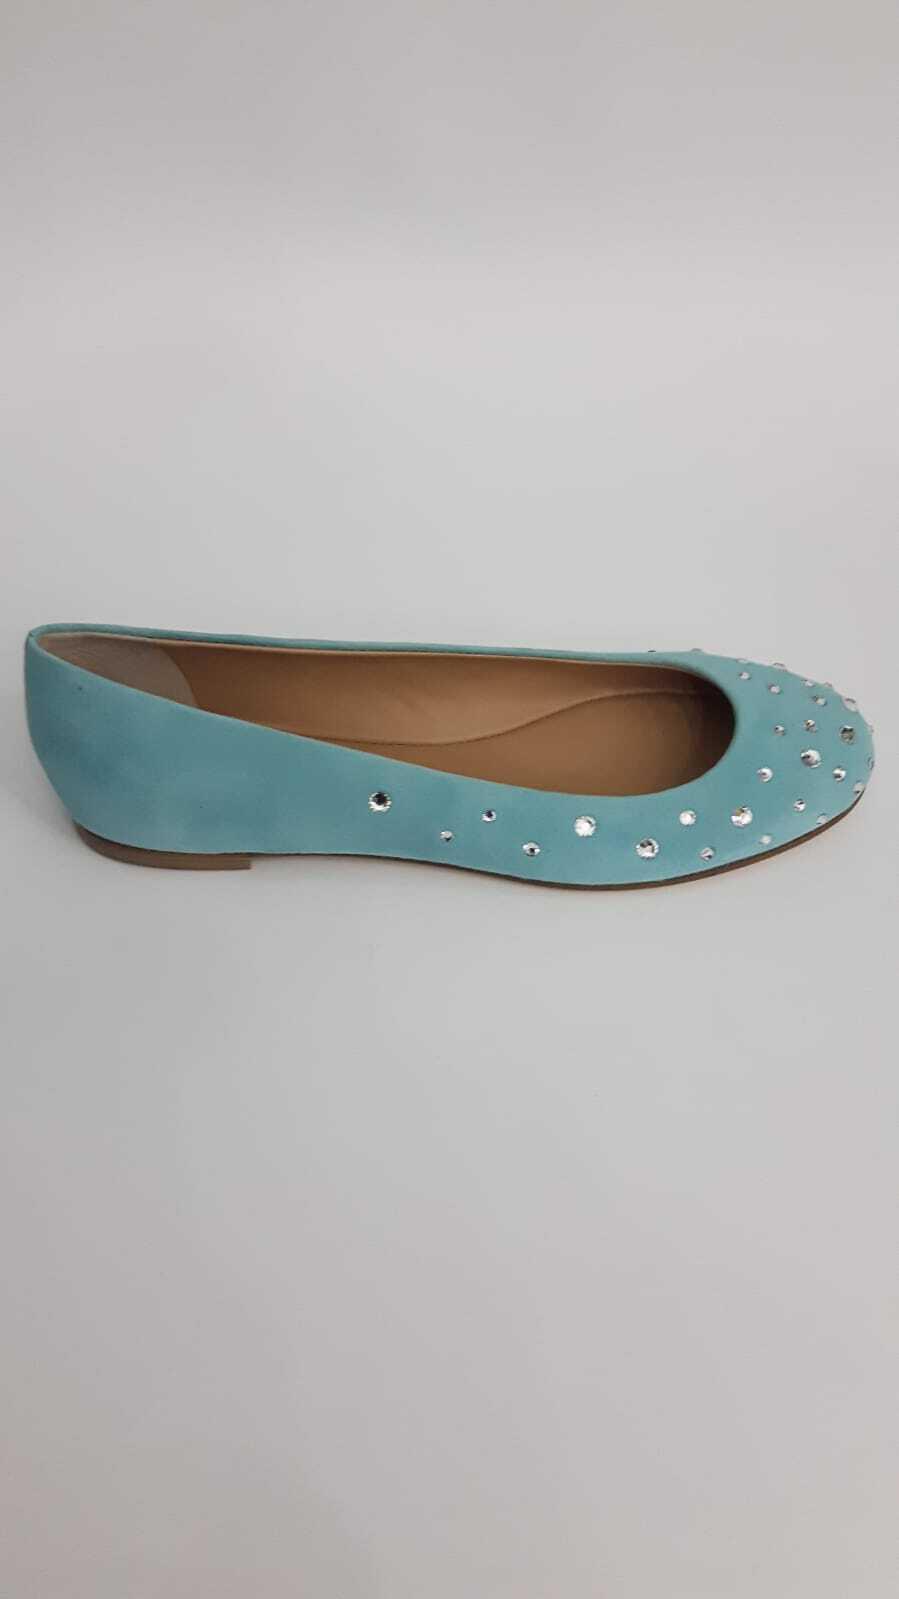 Giuseppe Zanotti Ballerina Baby Blau Woman n.37 Price List Price